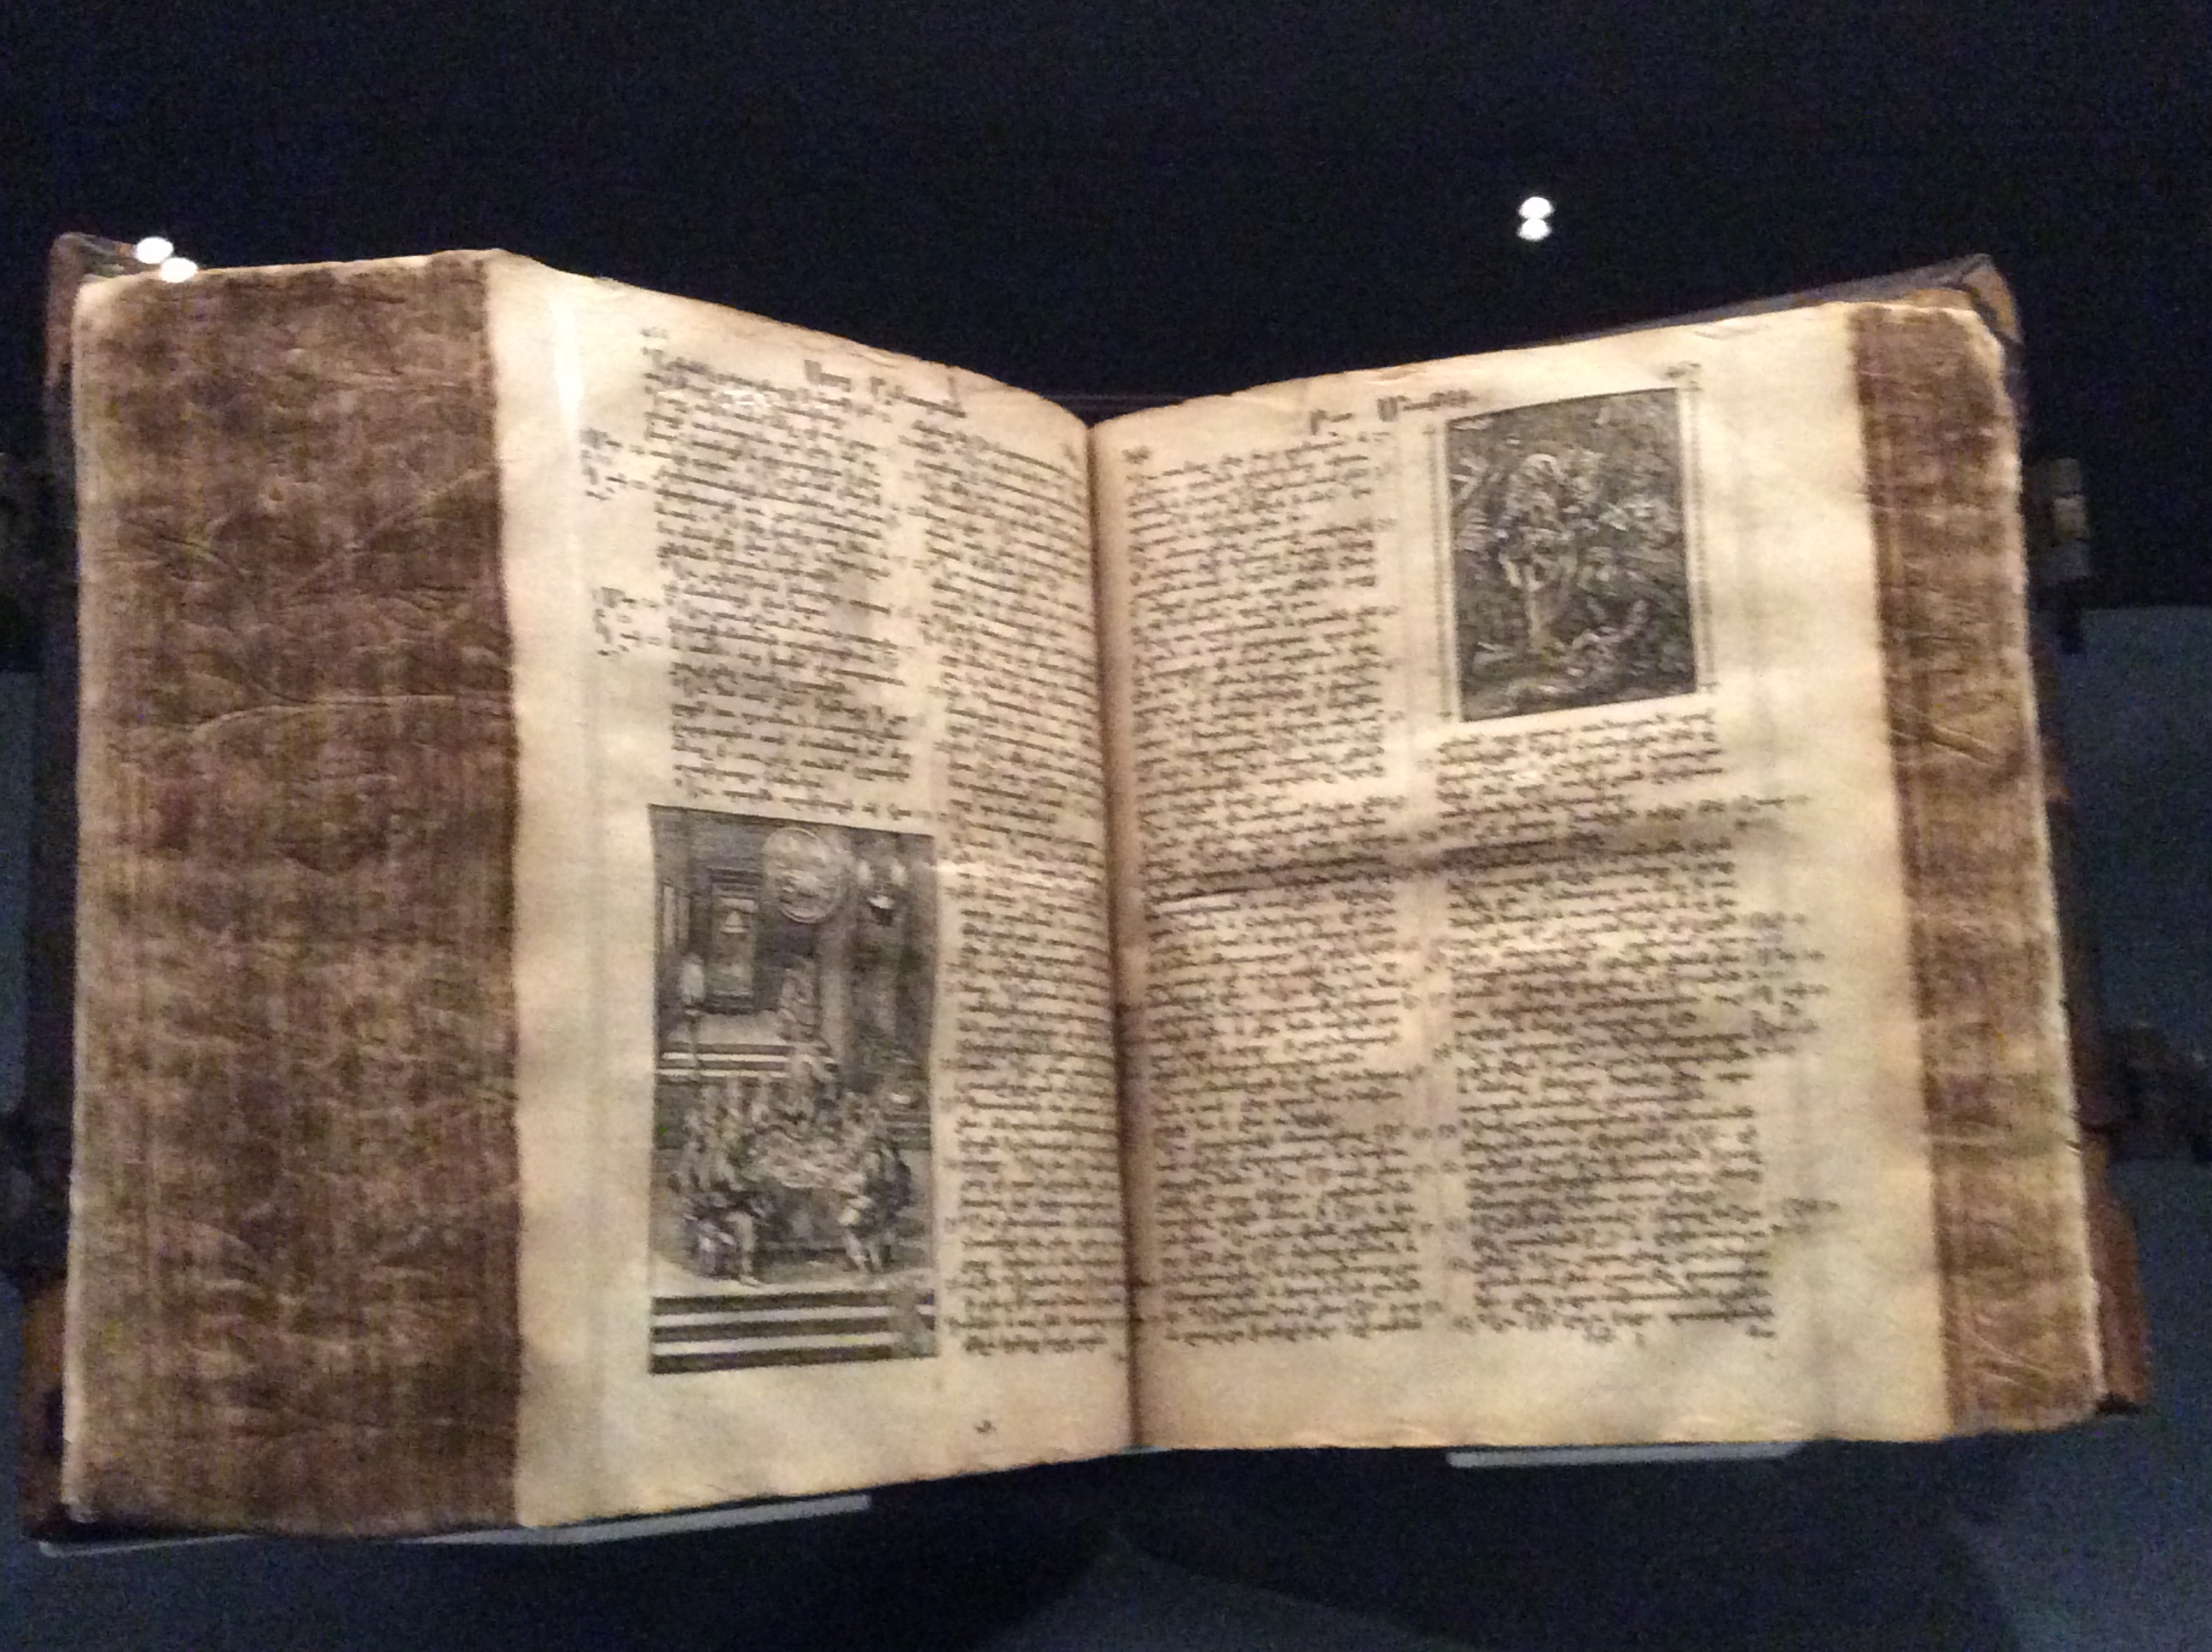 Fig. 28. Biblia sacra, Antwerp, 1646,